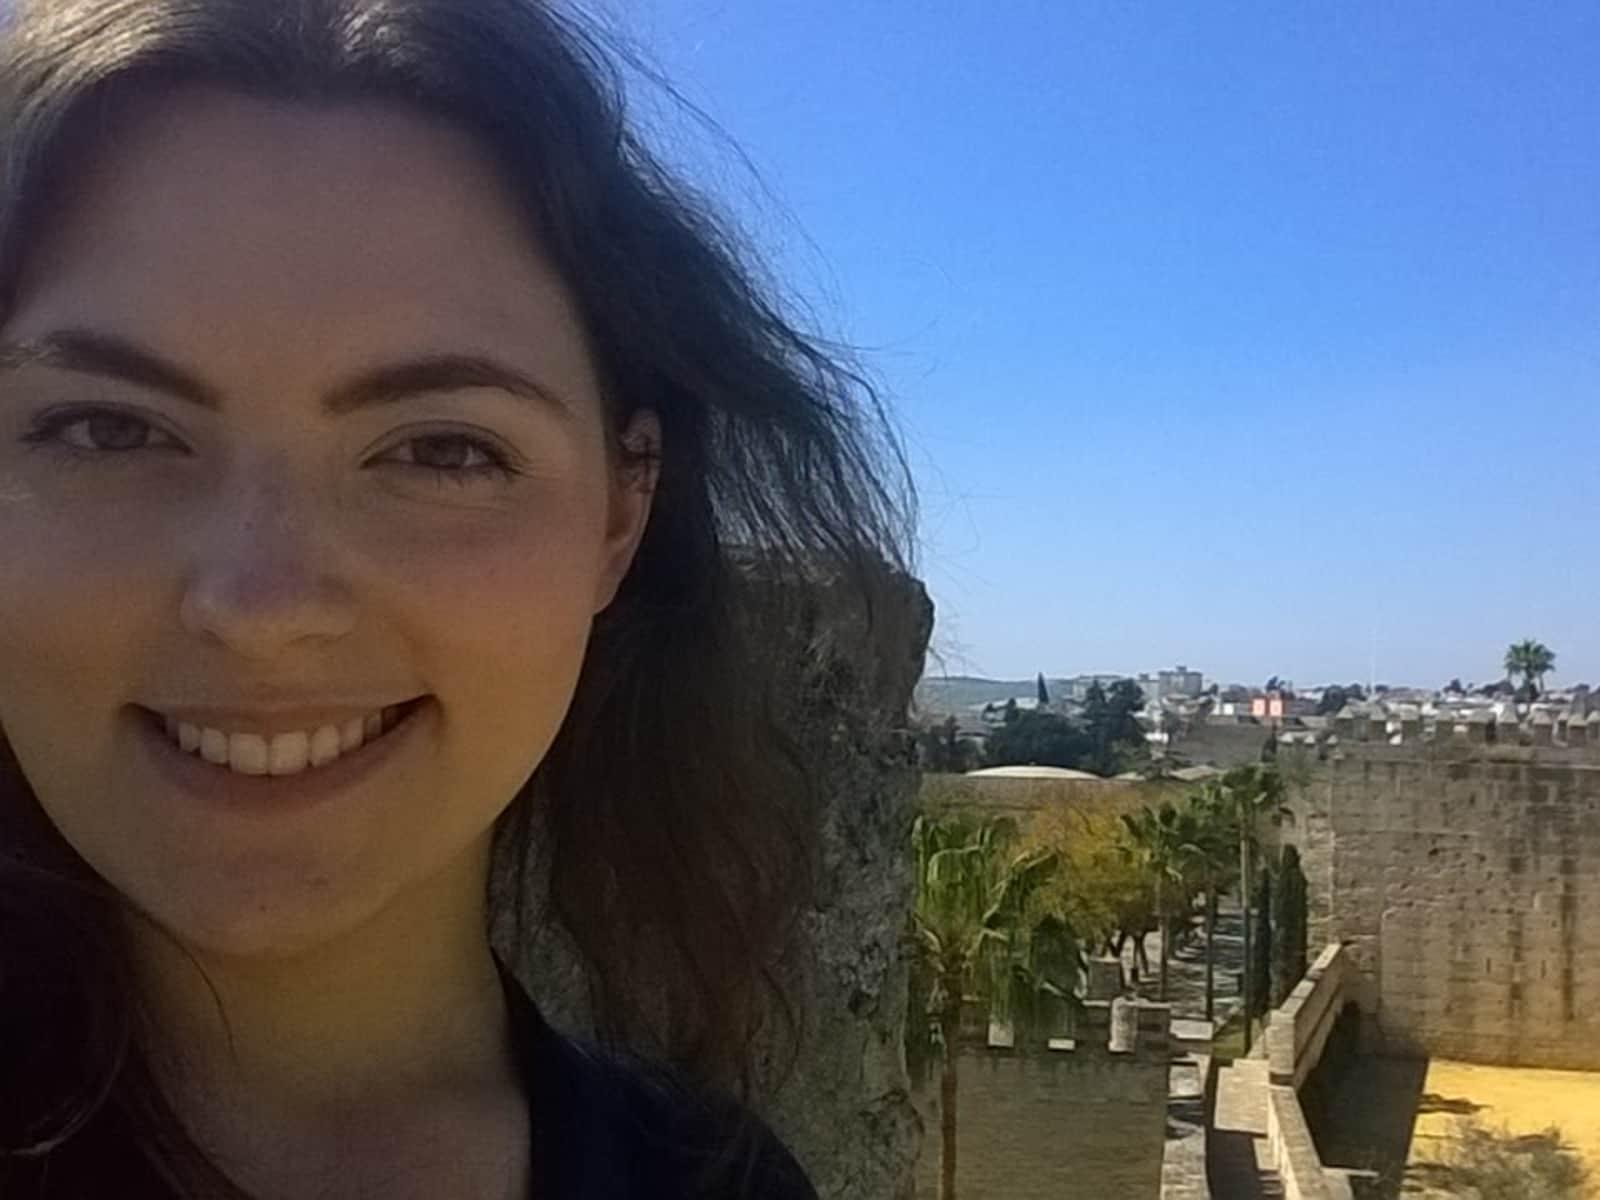 Beata from Cadiz, Spain